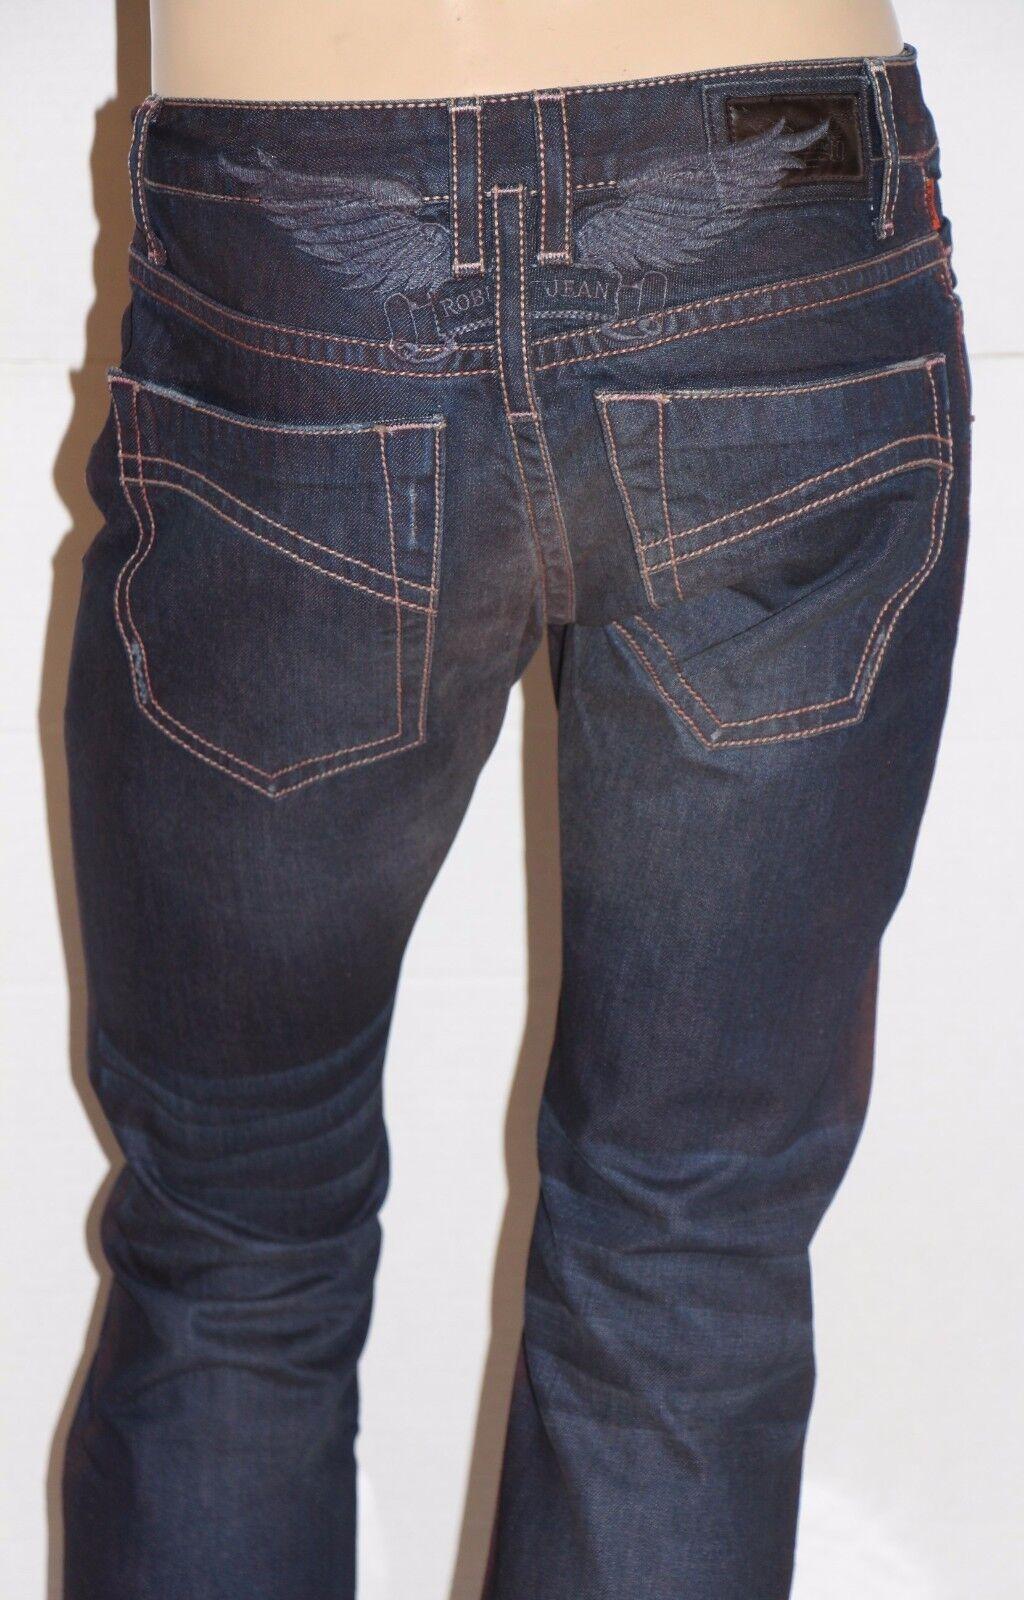 CHRISTMAS SPECIAL  New Men's ROBIN'S JEAN sz 38 MARLON Slim Straight Jeans